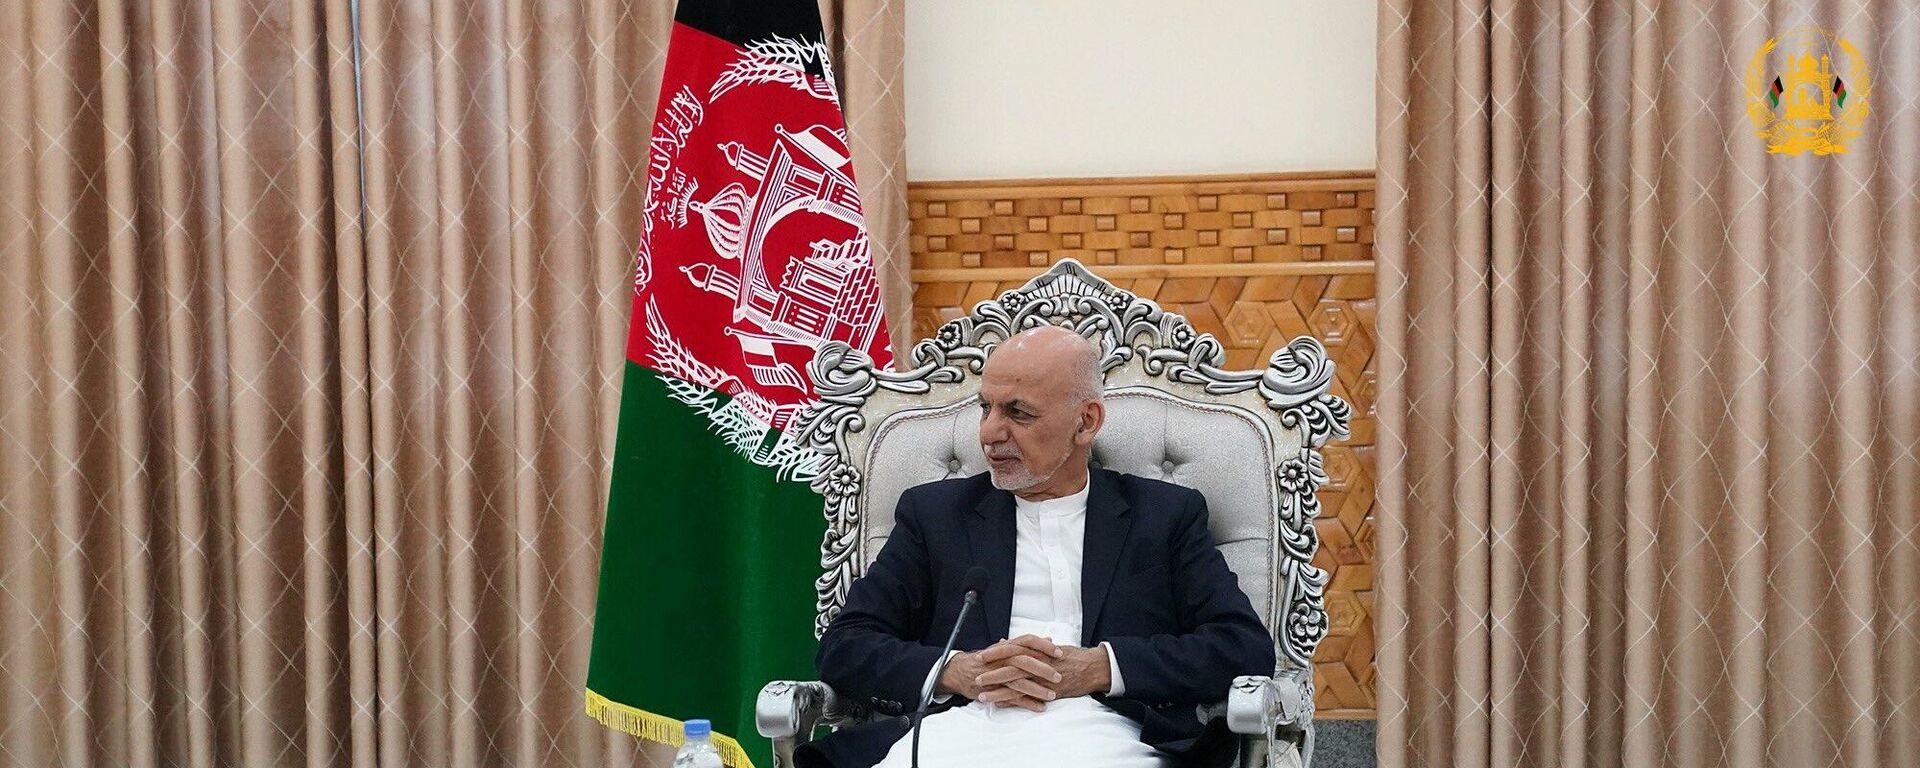 Президент Афганистана Ашраф Гани - Sputnik Таджикистан, 1920, 11.08.2021